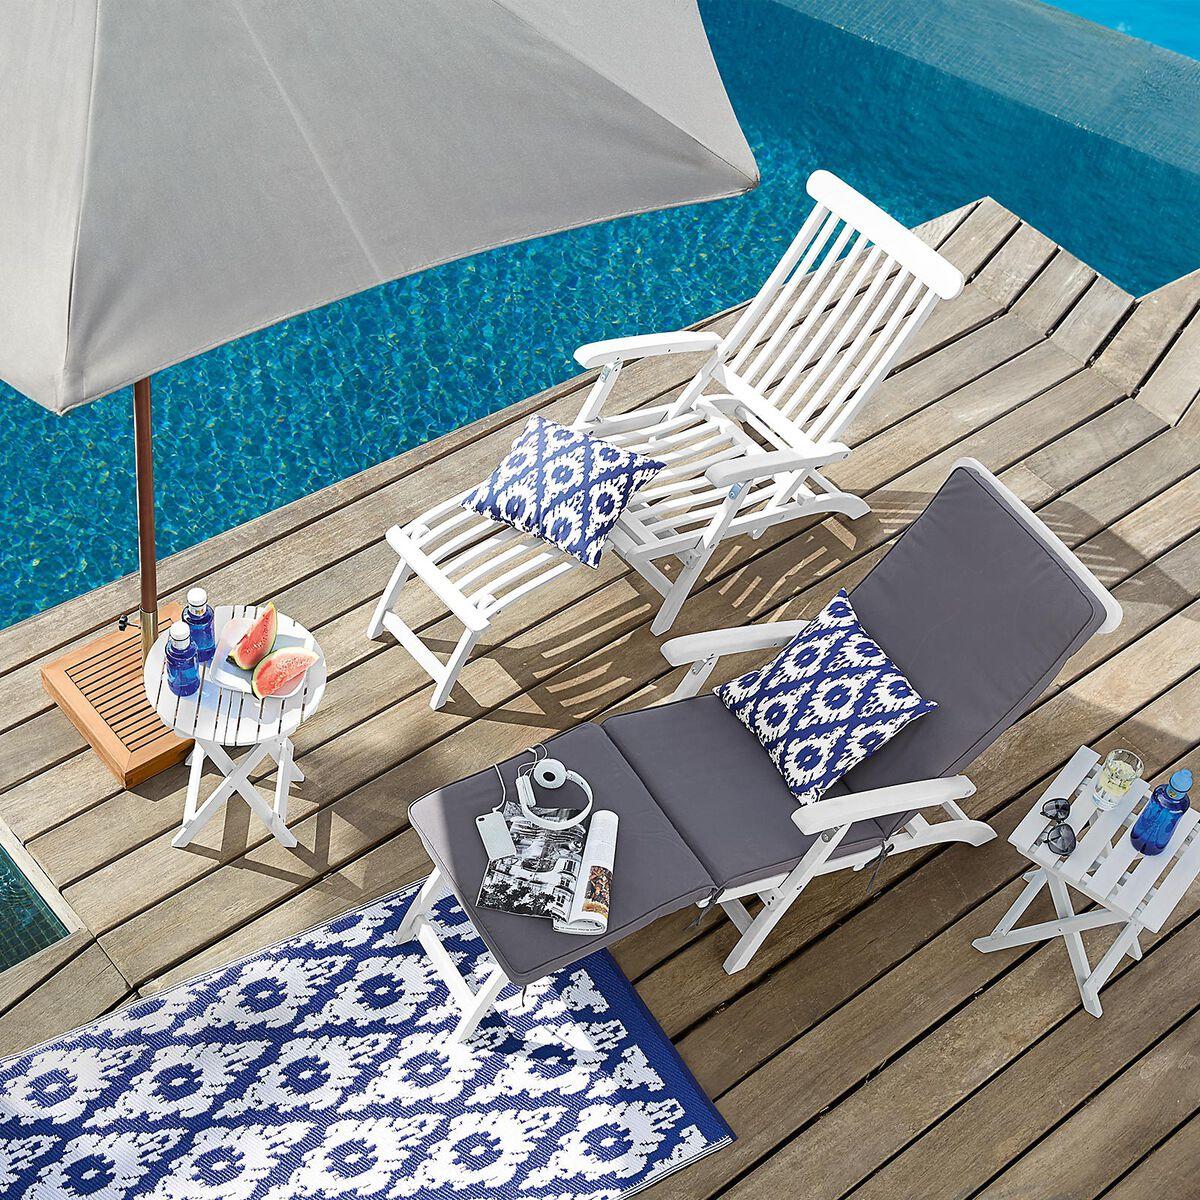 liegestuhl inklusive auflage akazienholz 100 fsc zertifiziert wei ca b 77 x l 166 x h 93 cm. Black Bedroom Furniture Sets. Home Design Ideas